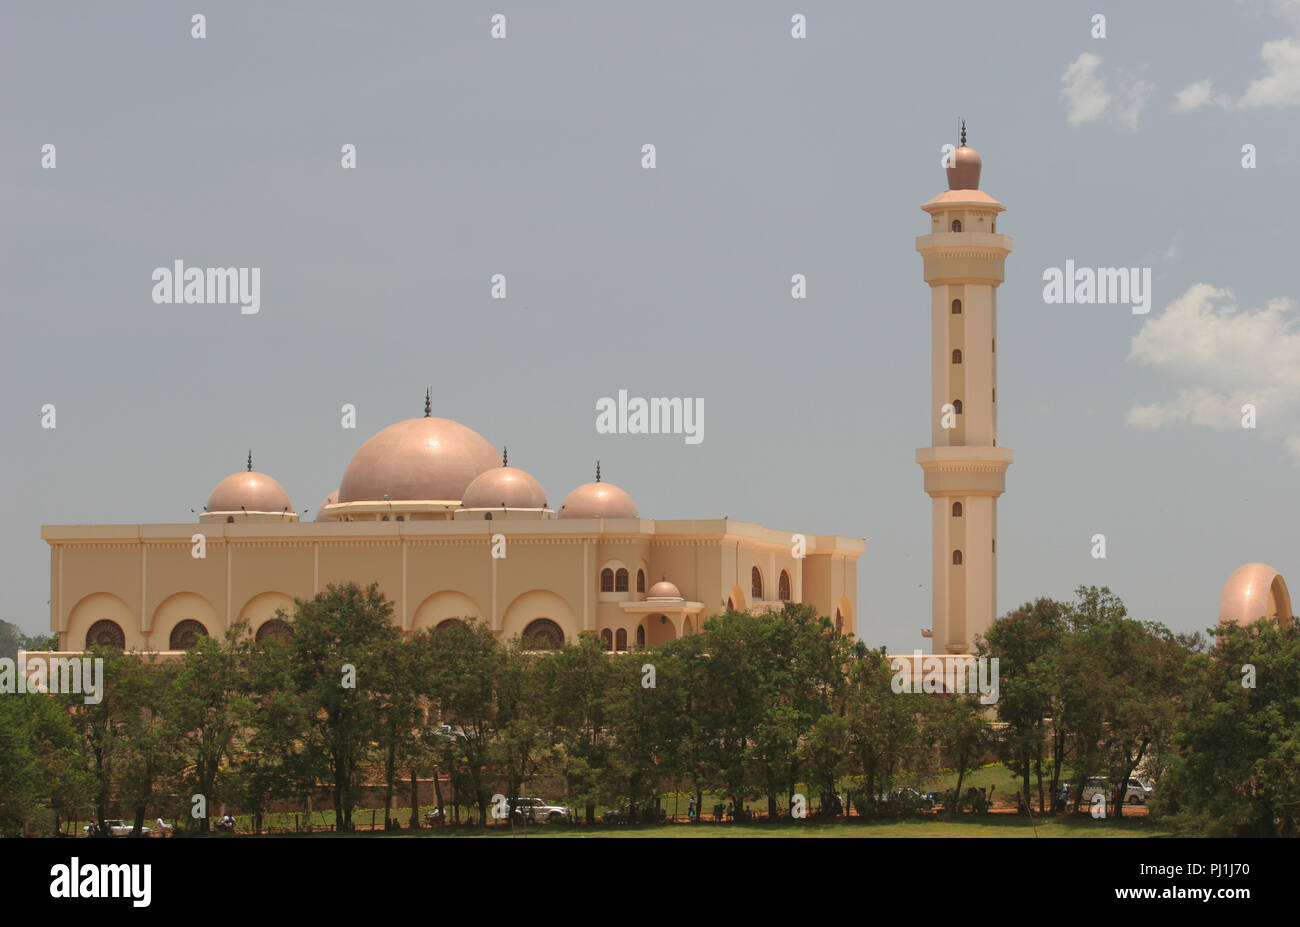 The Gadaffi Mosque, Kampala, Uganda. - Stock Image